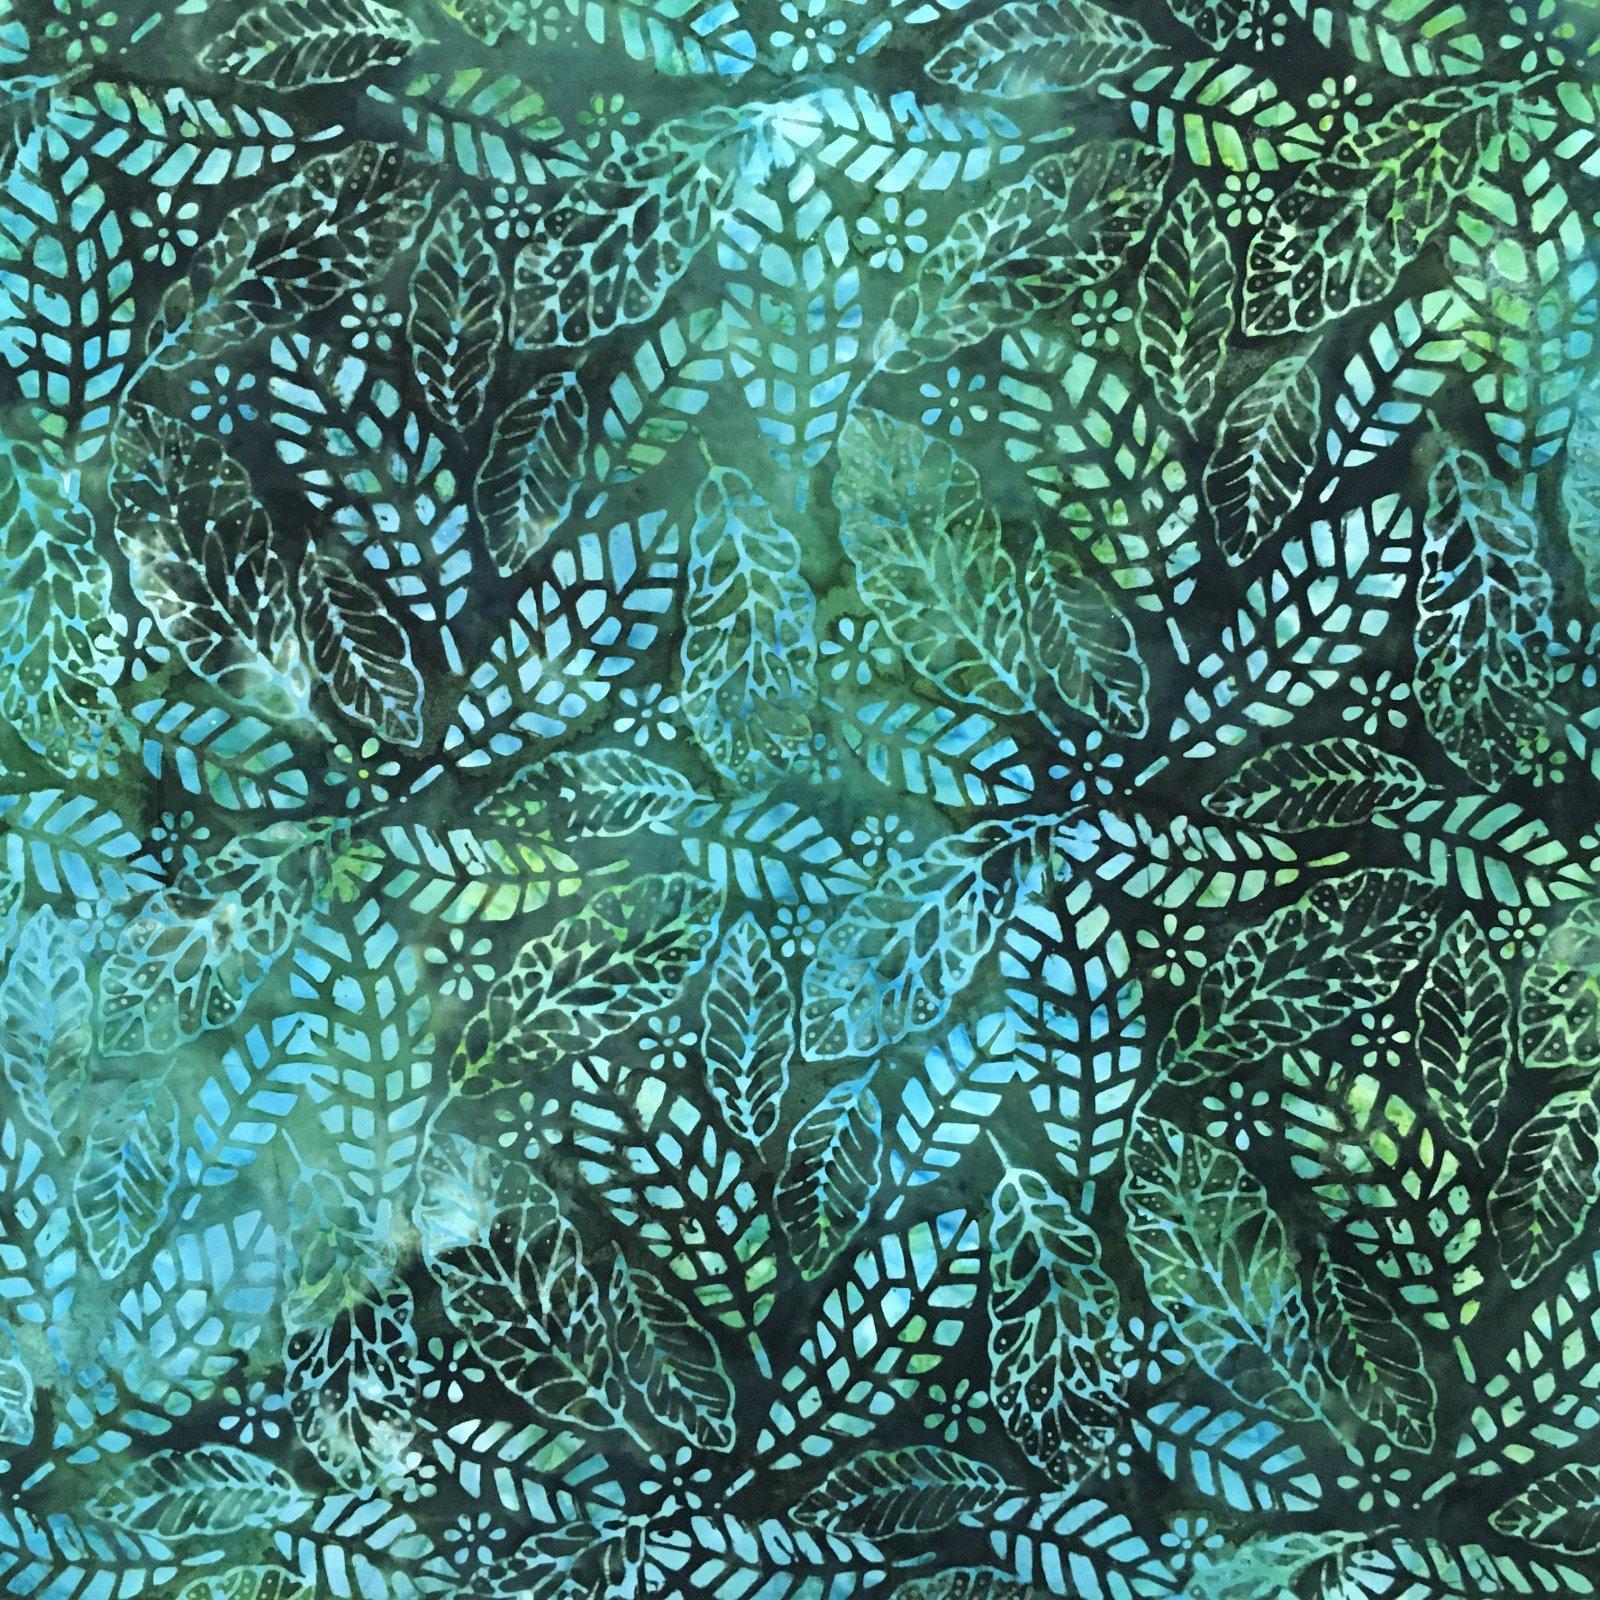 Benartex Tropical Nights Balis Rock Leaf Emerald